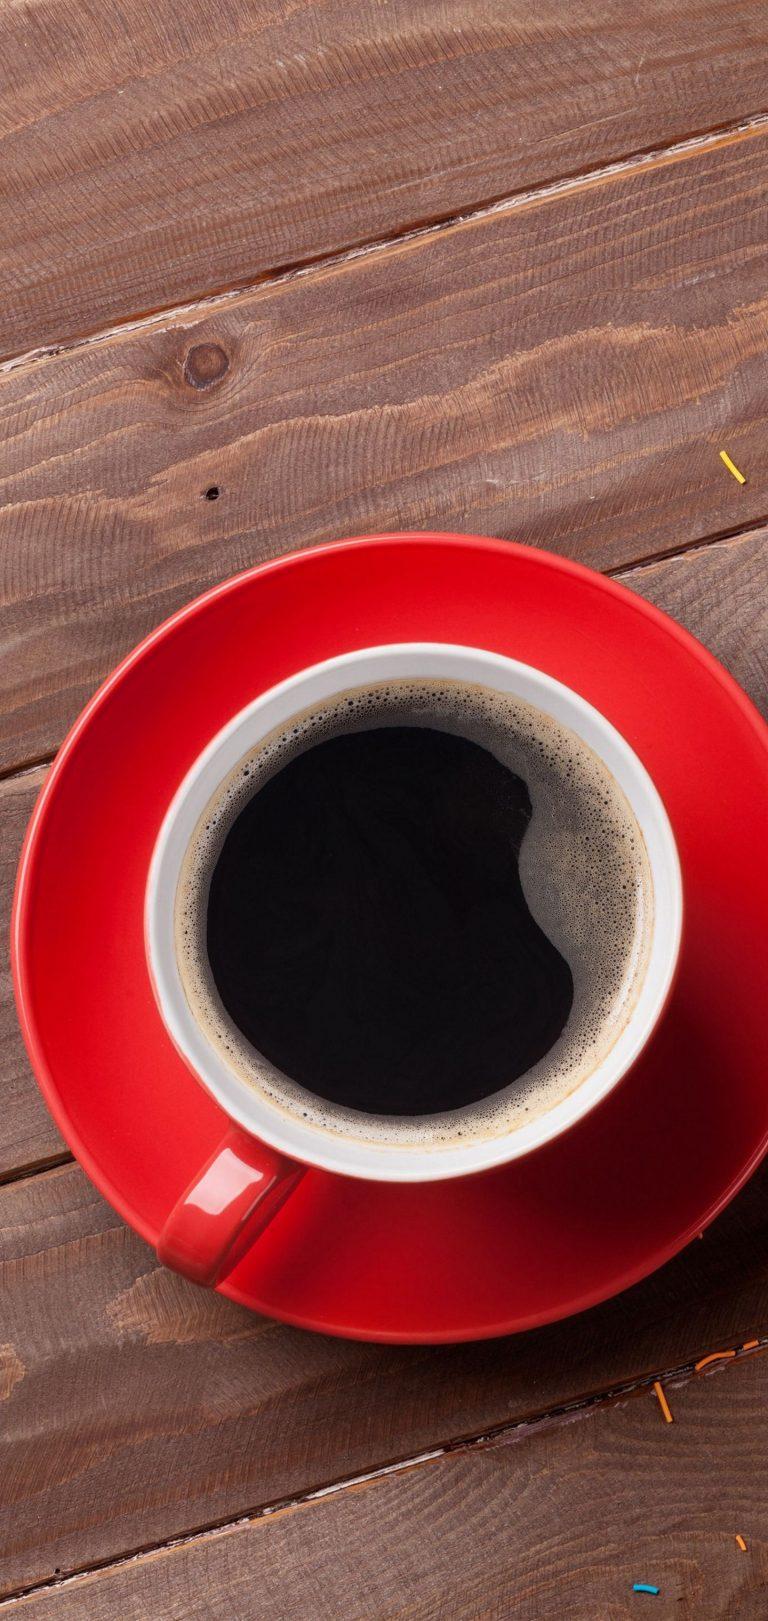 Cup Dark Coffee Wallpaper 1440x3040 768x1621